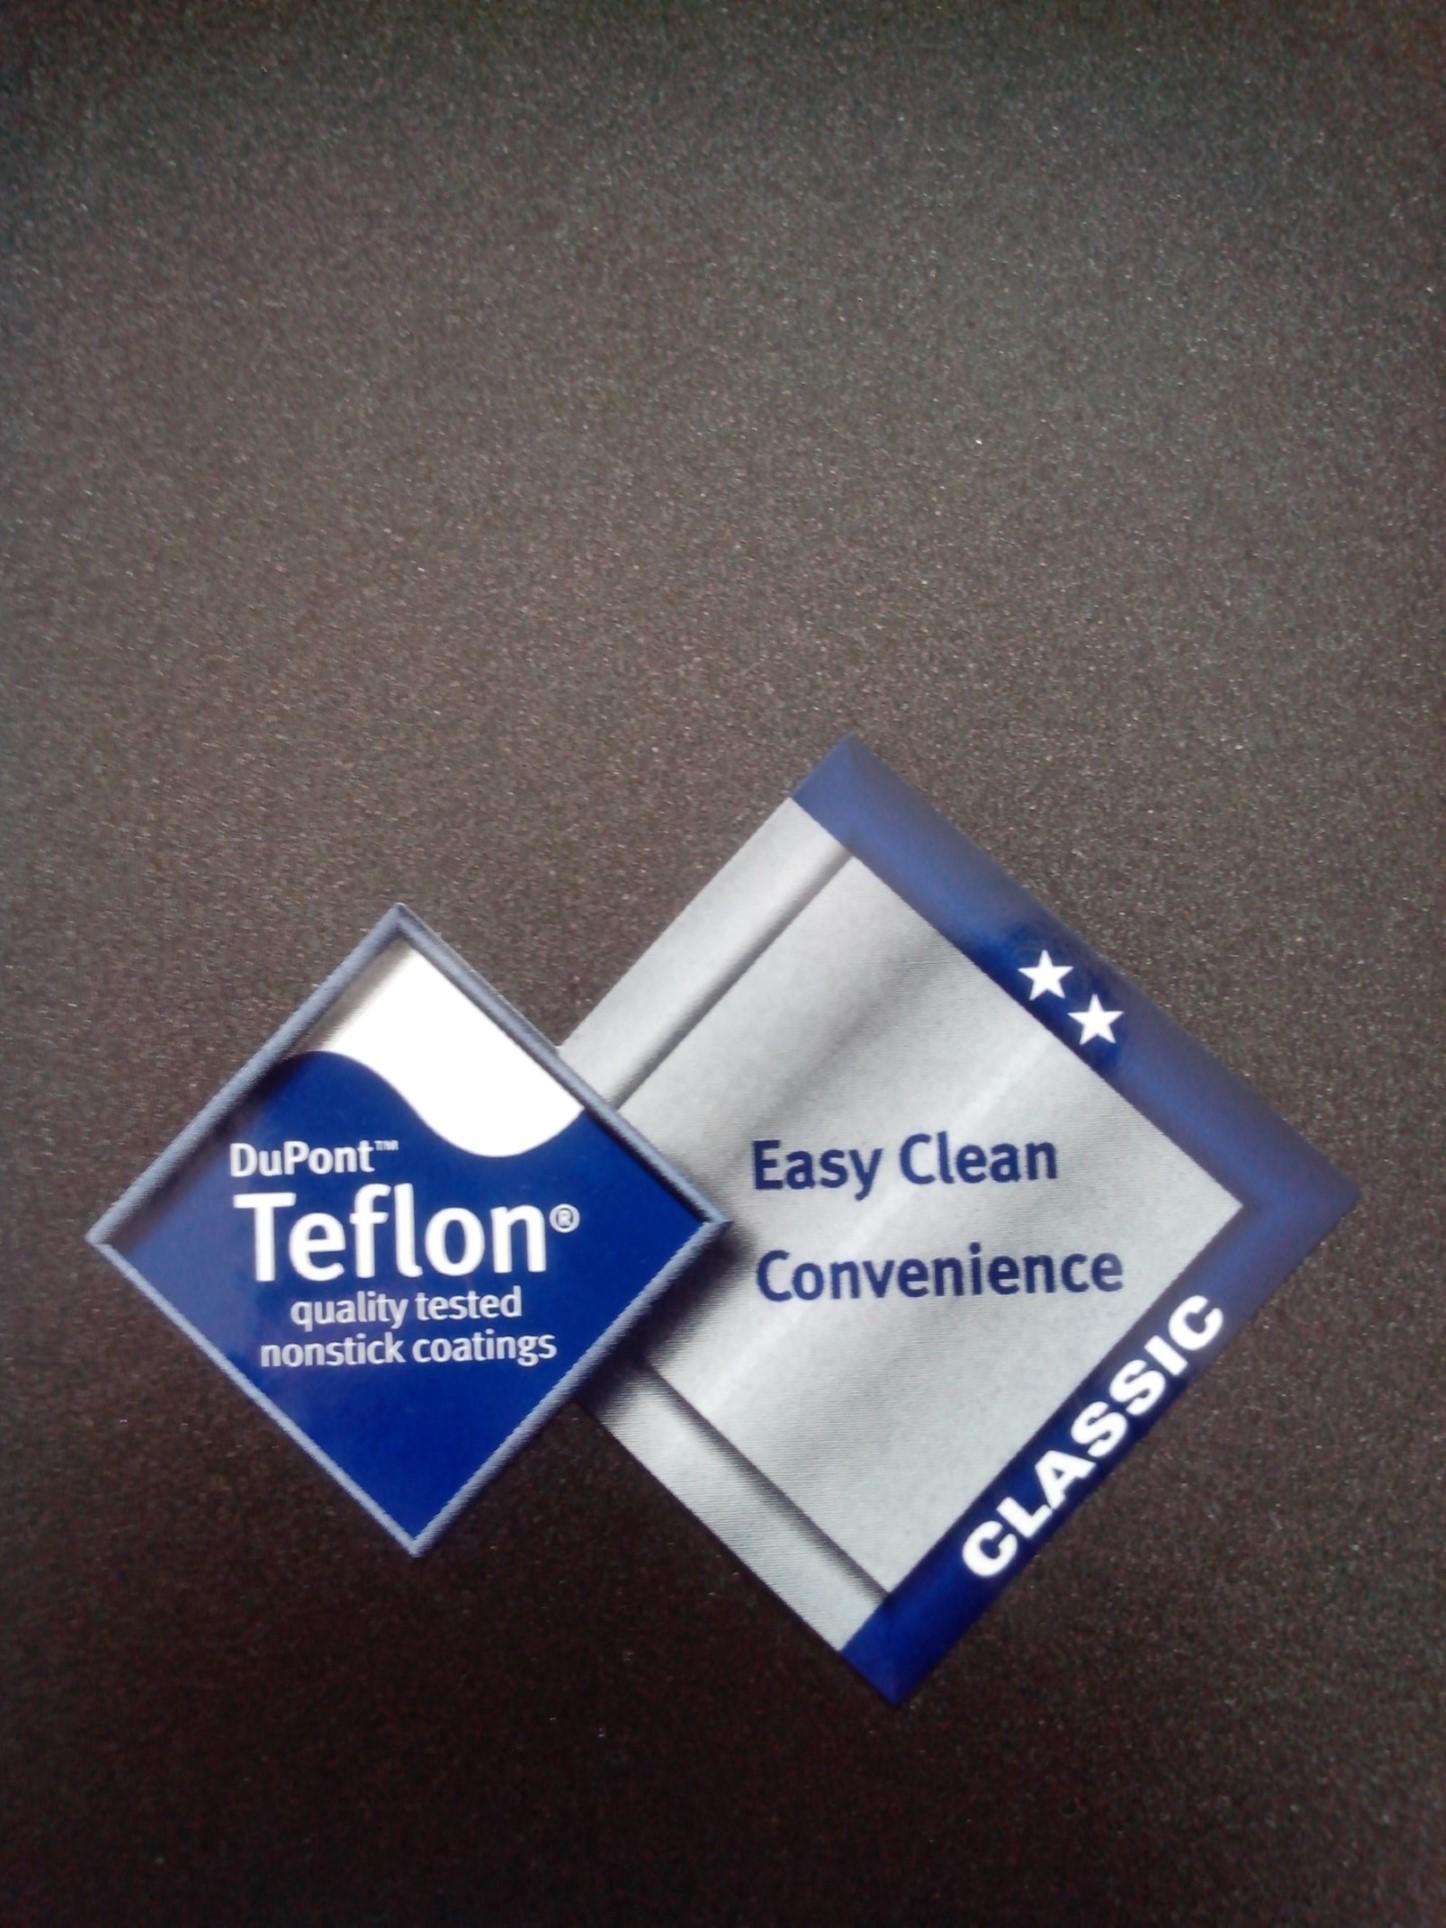 Teflon productie verder onder druk - DuPont splitst teflonproductie af